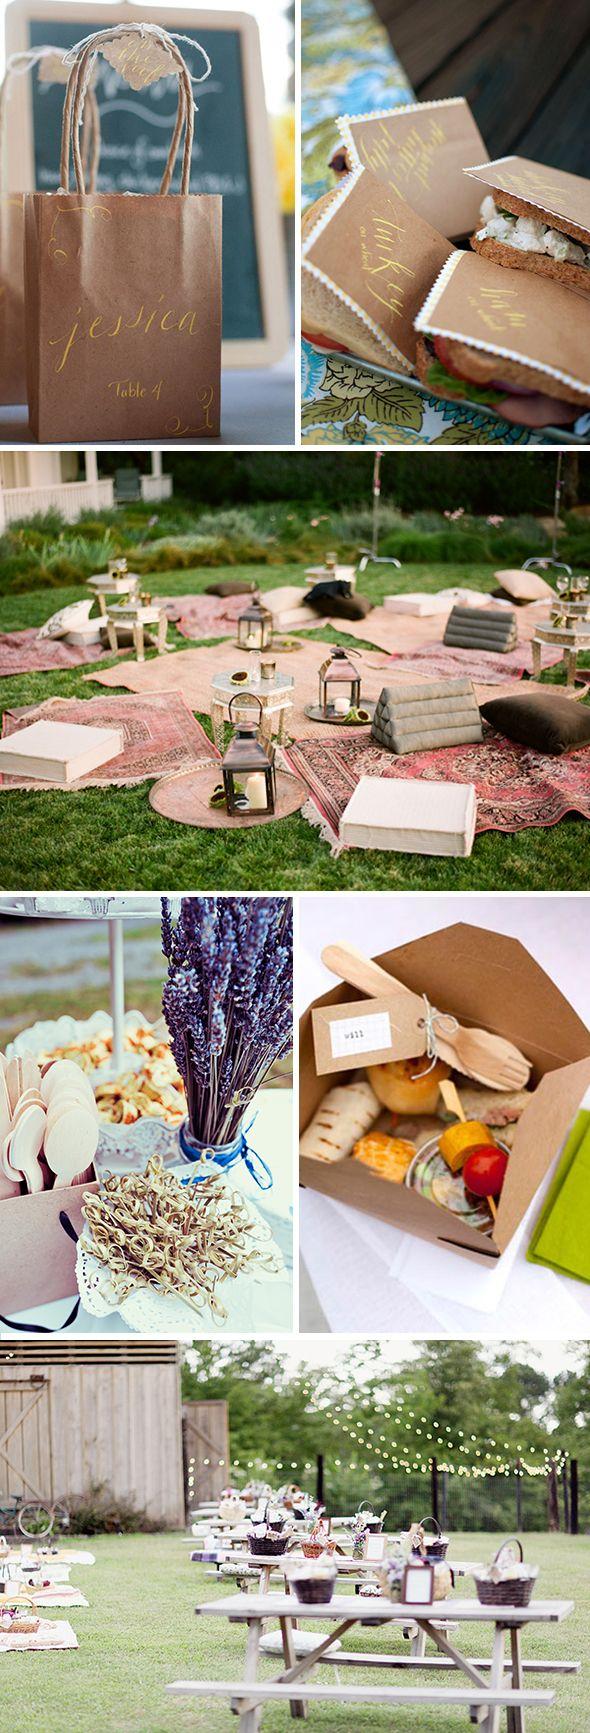 picnic wedding (The Bridal Bar)